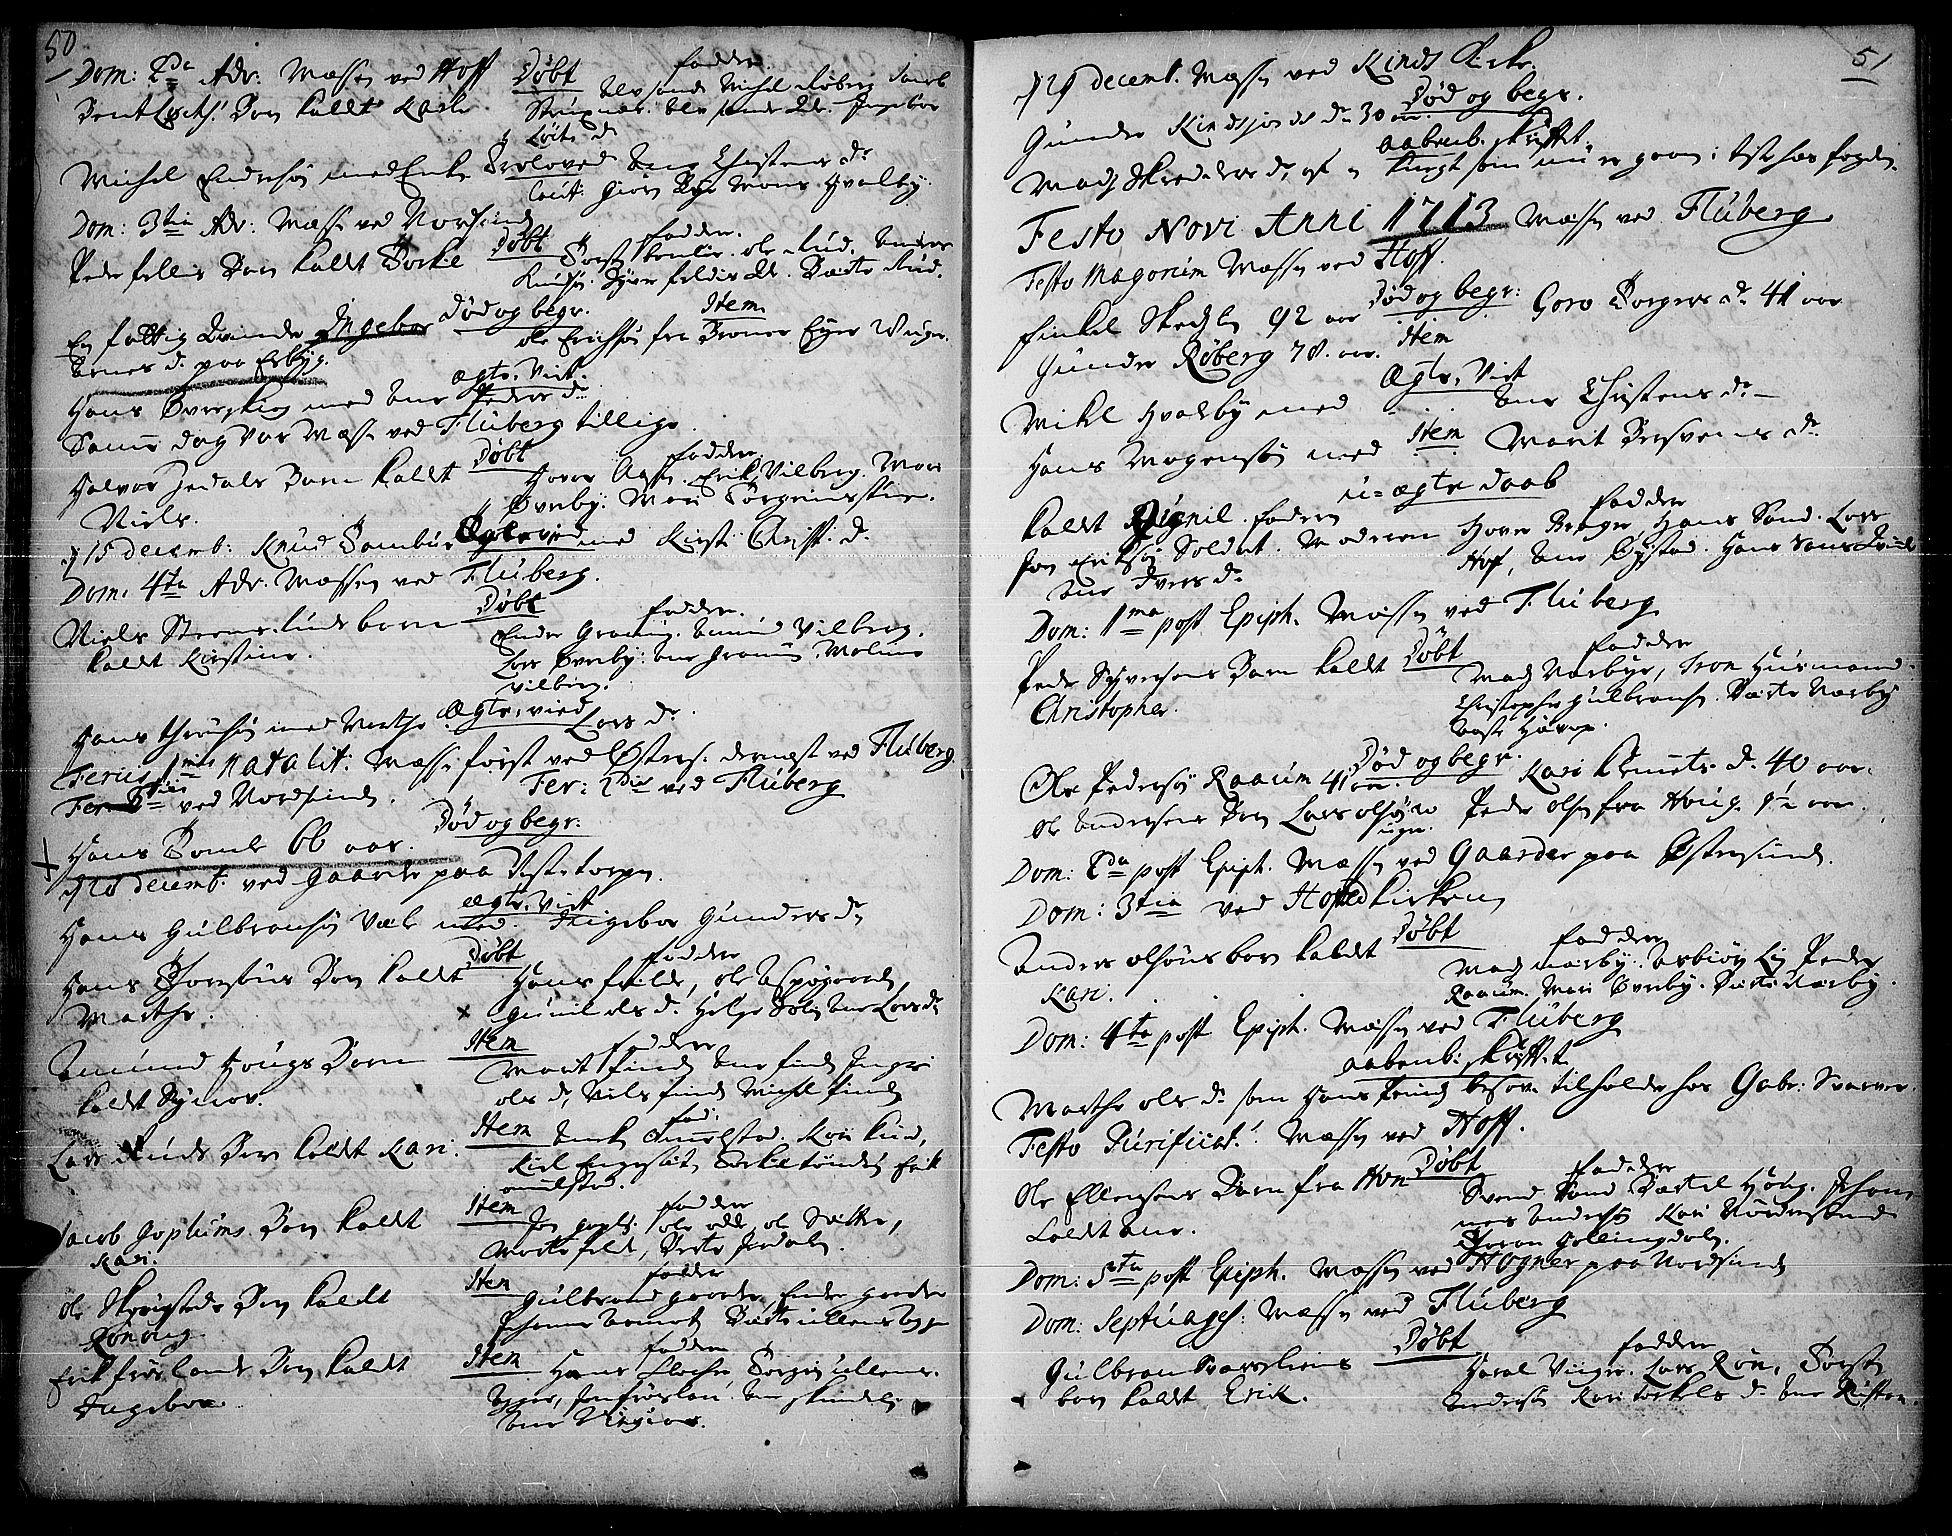 SAH, Land prestekontor, Ministerialbok nr. 1, 1708-1732, s. 50-51